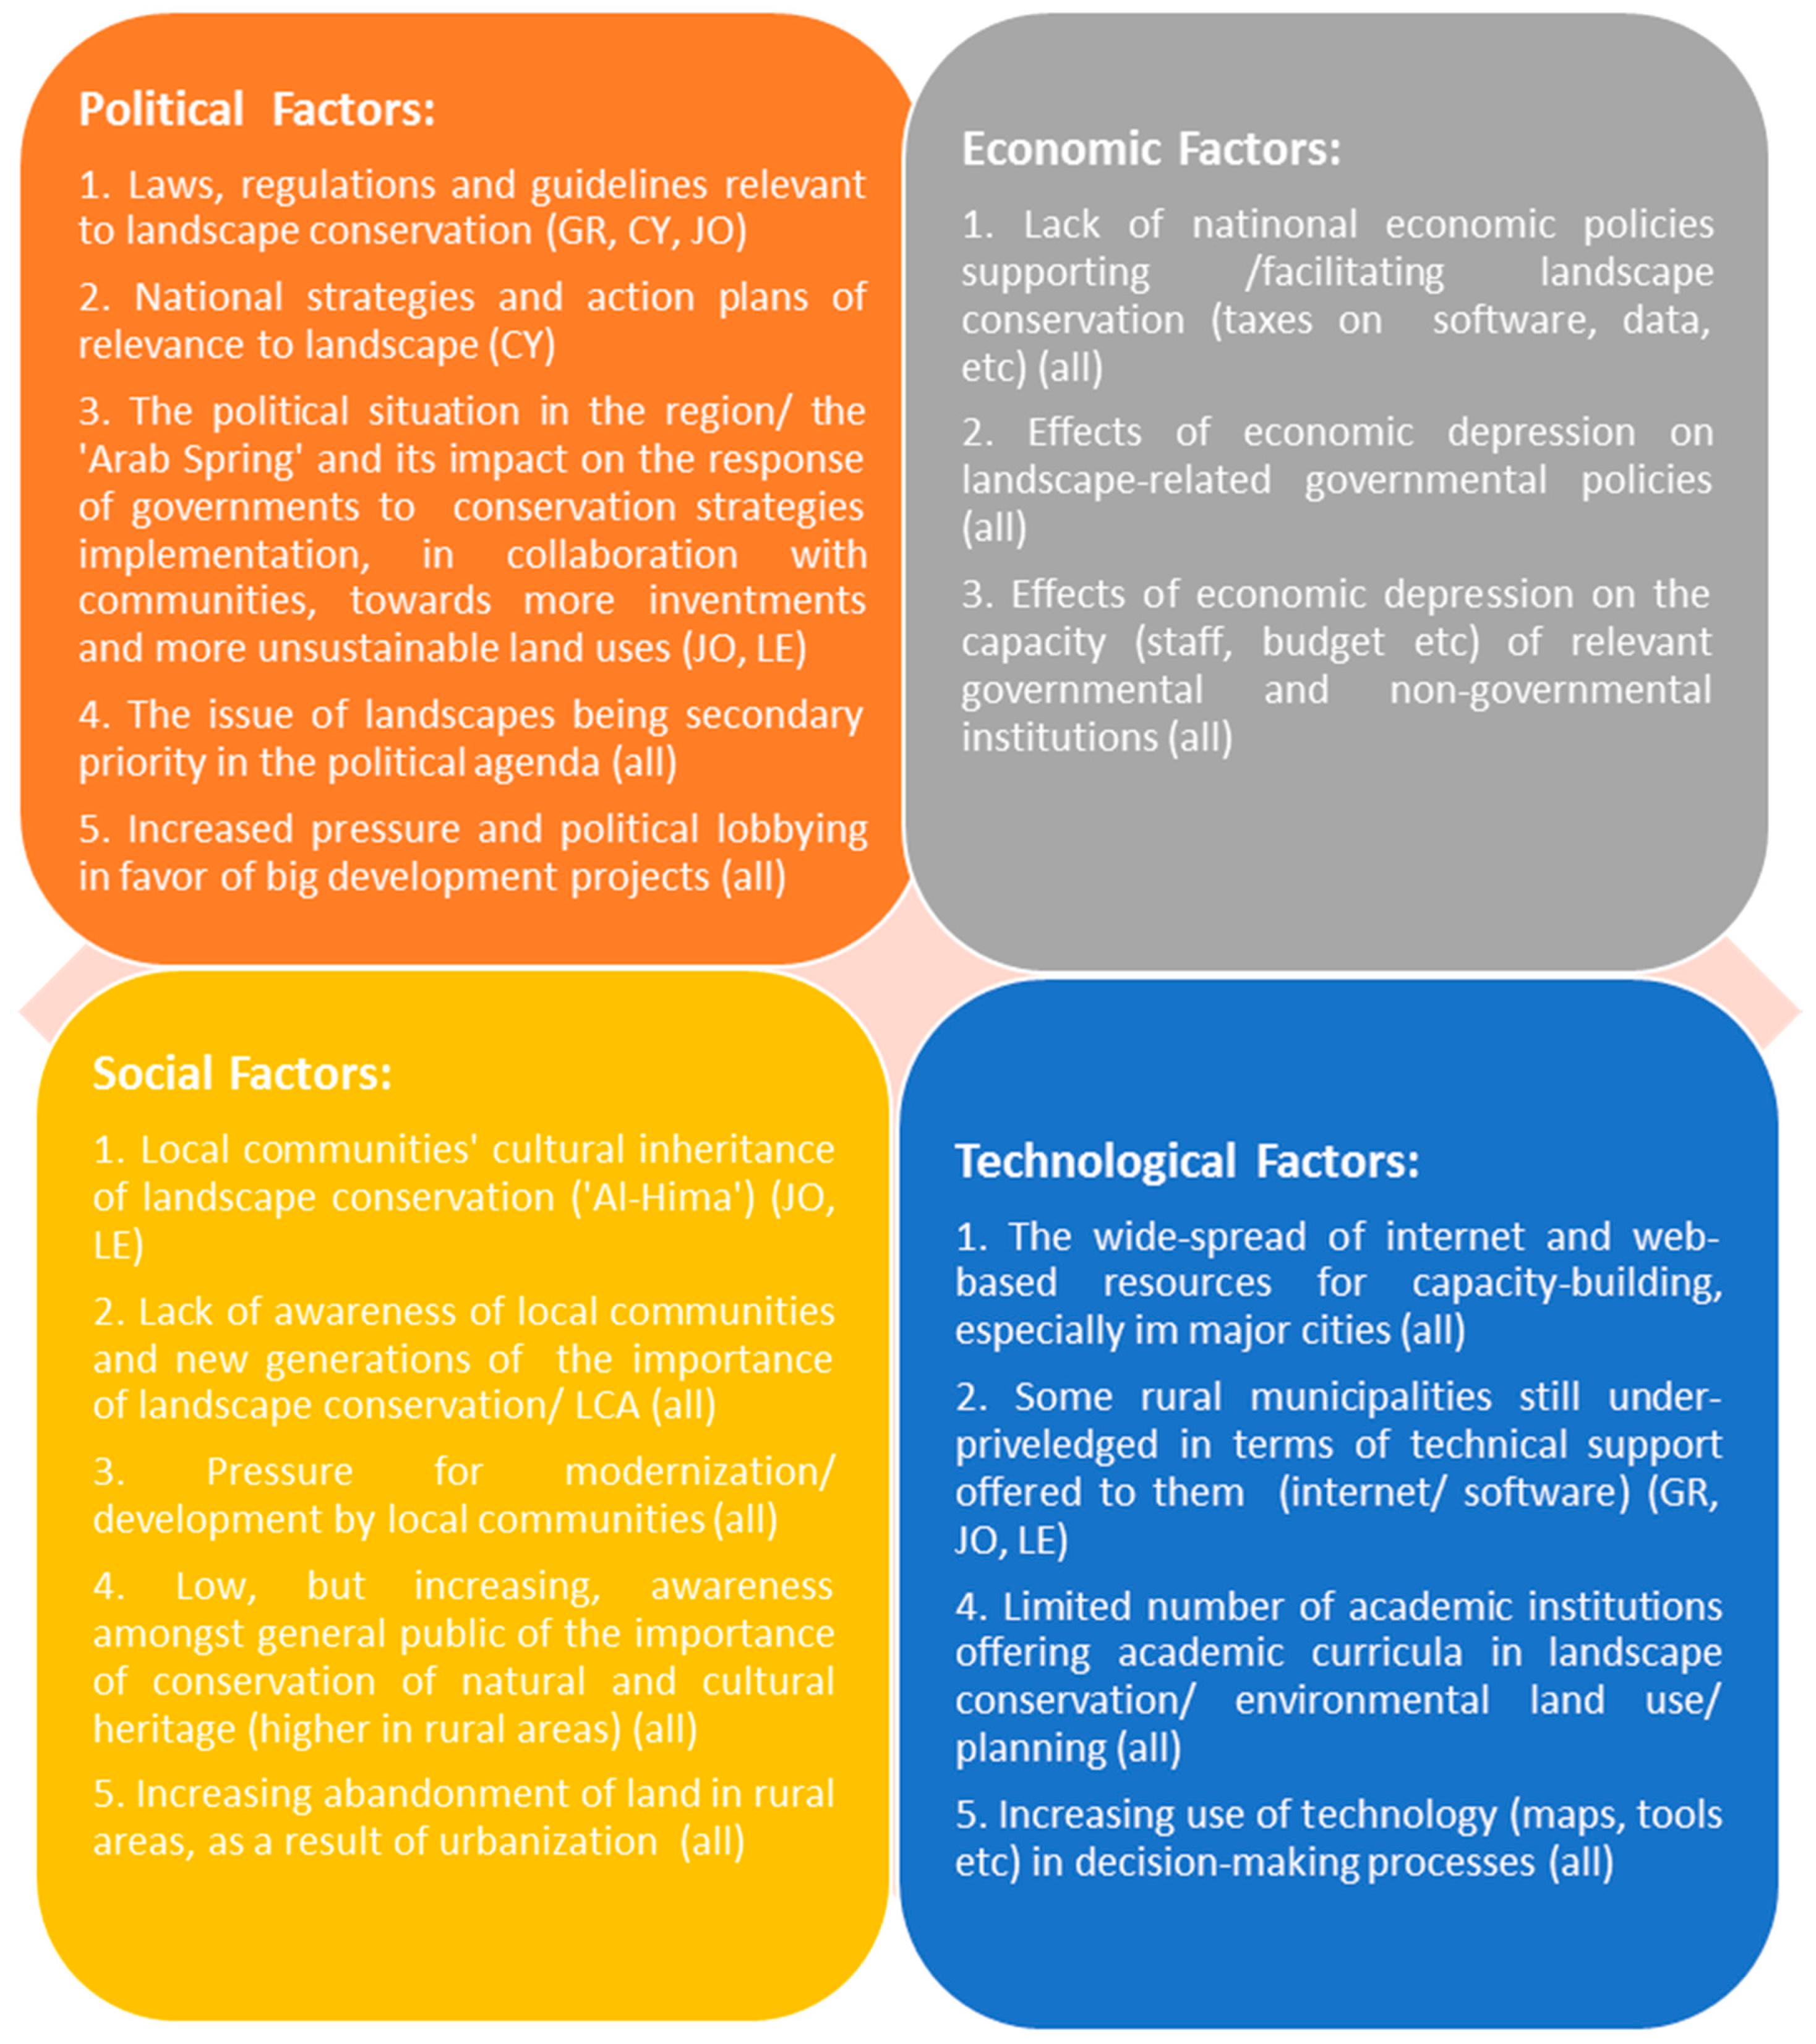 pestle analysis of cyprus